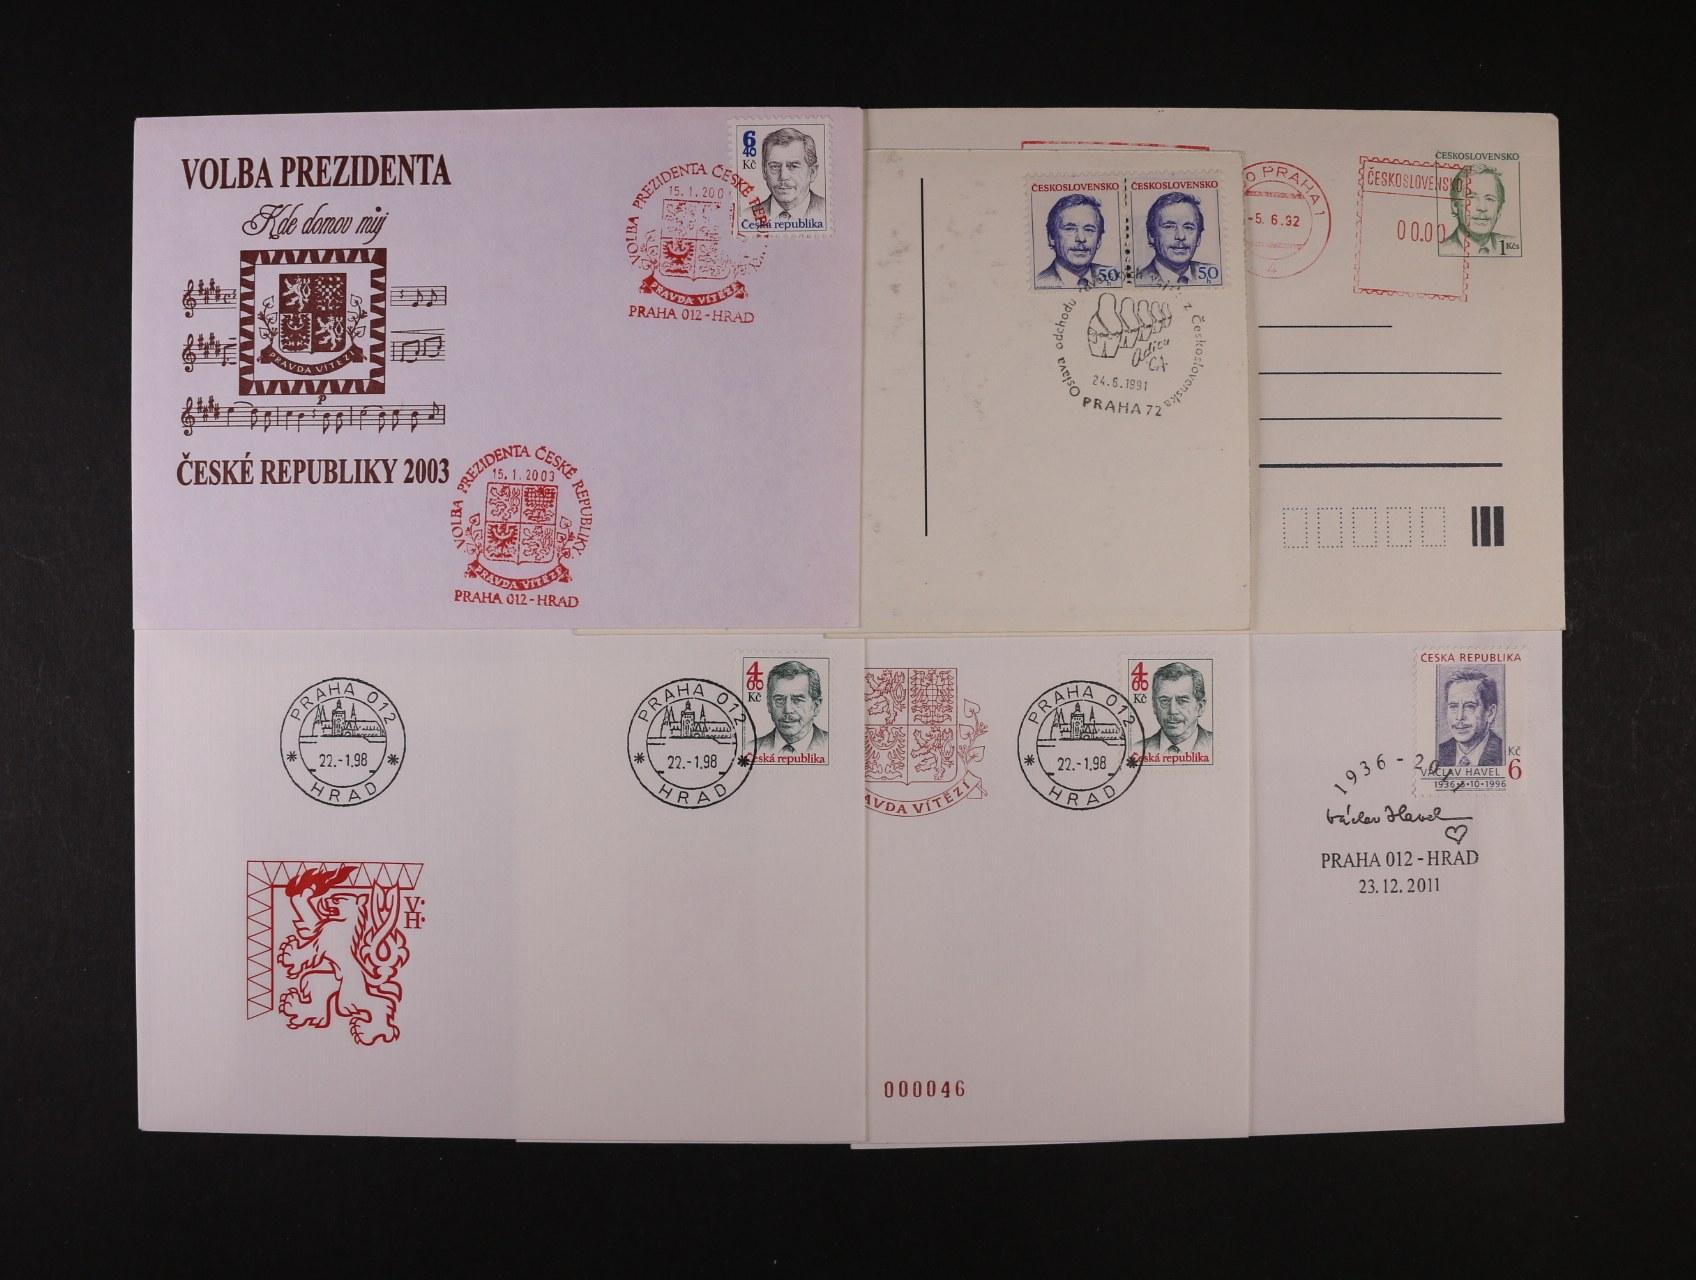 sestava 14 ks různých celistvostí vydaných k volbě prezidenta republiky, zajímavé